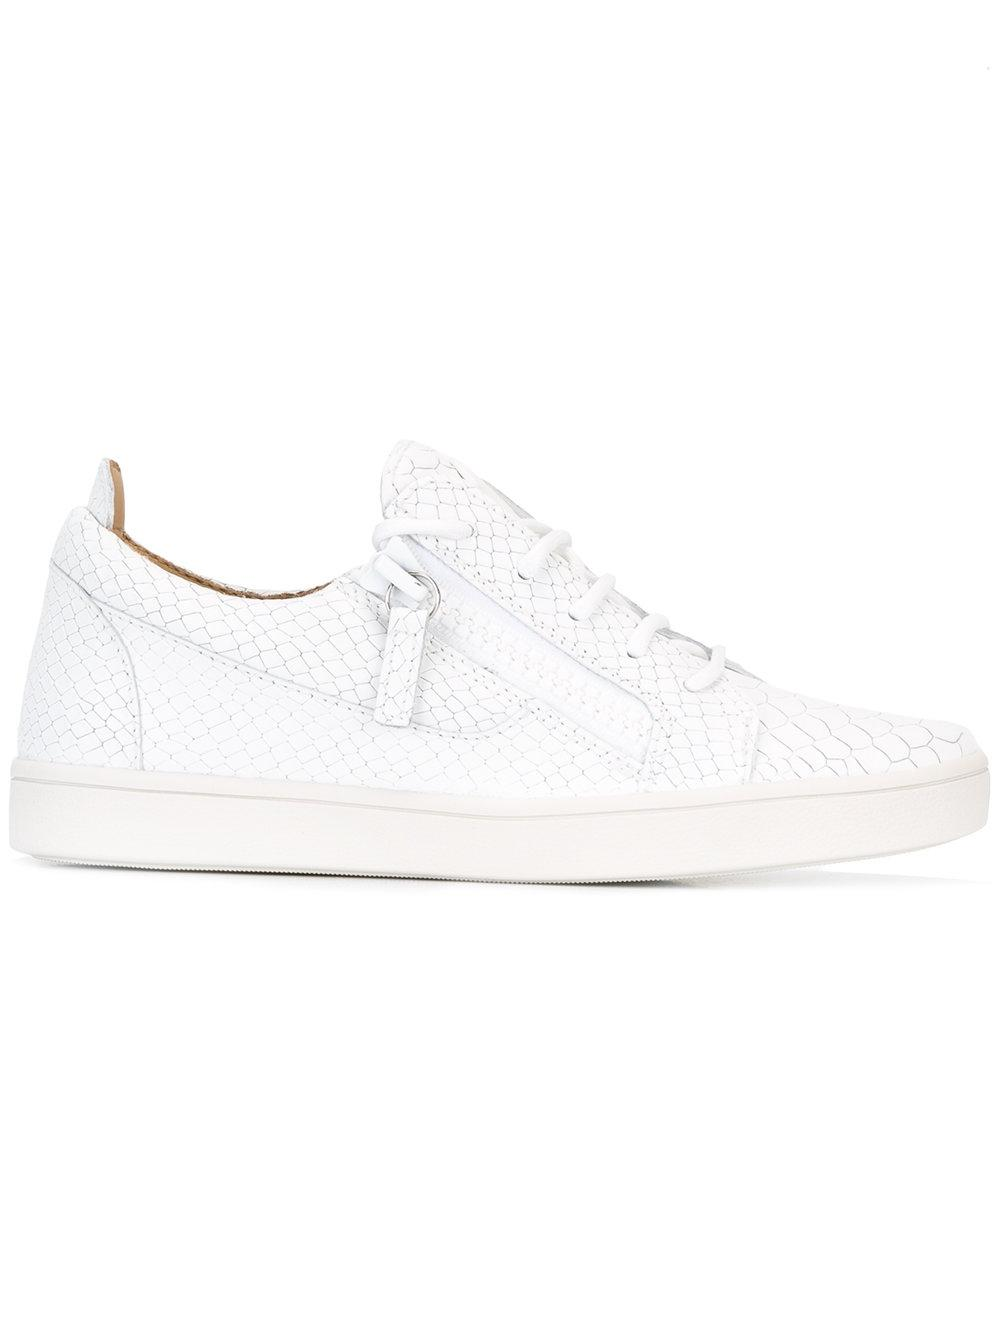 giuseppe zanotti nicki sneakers in white lyst